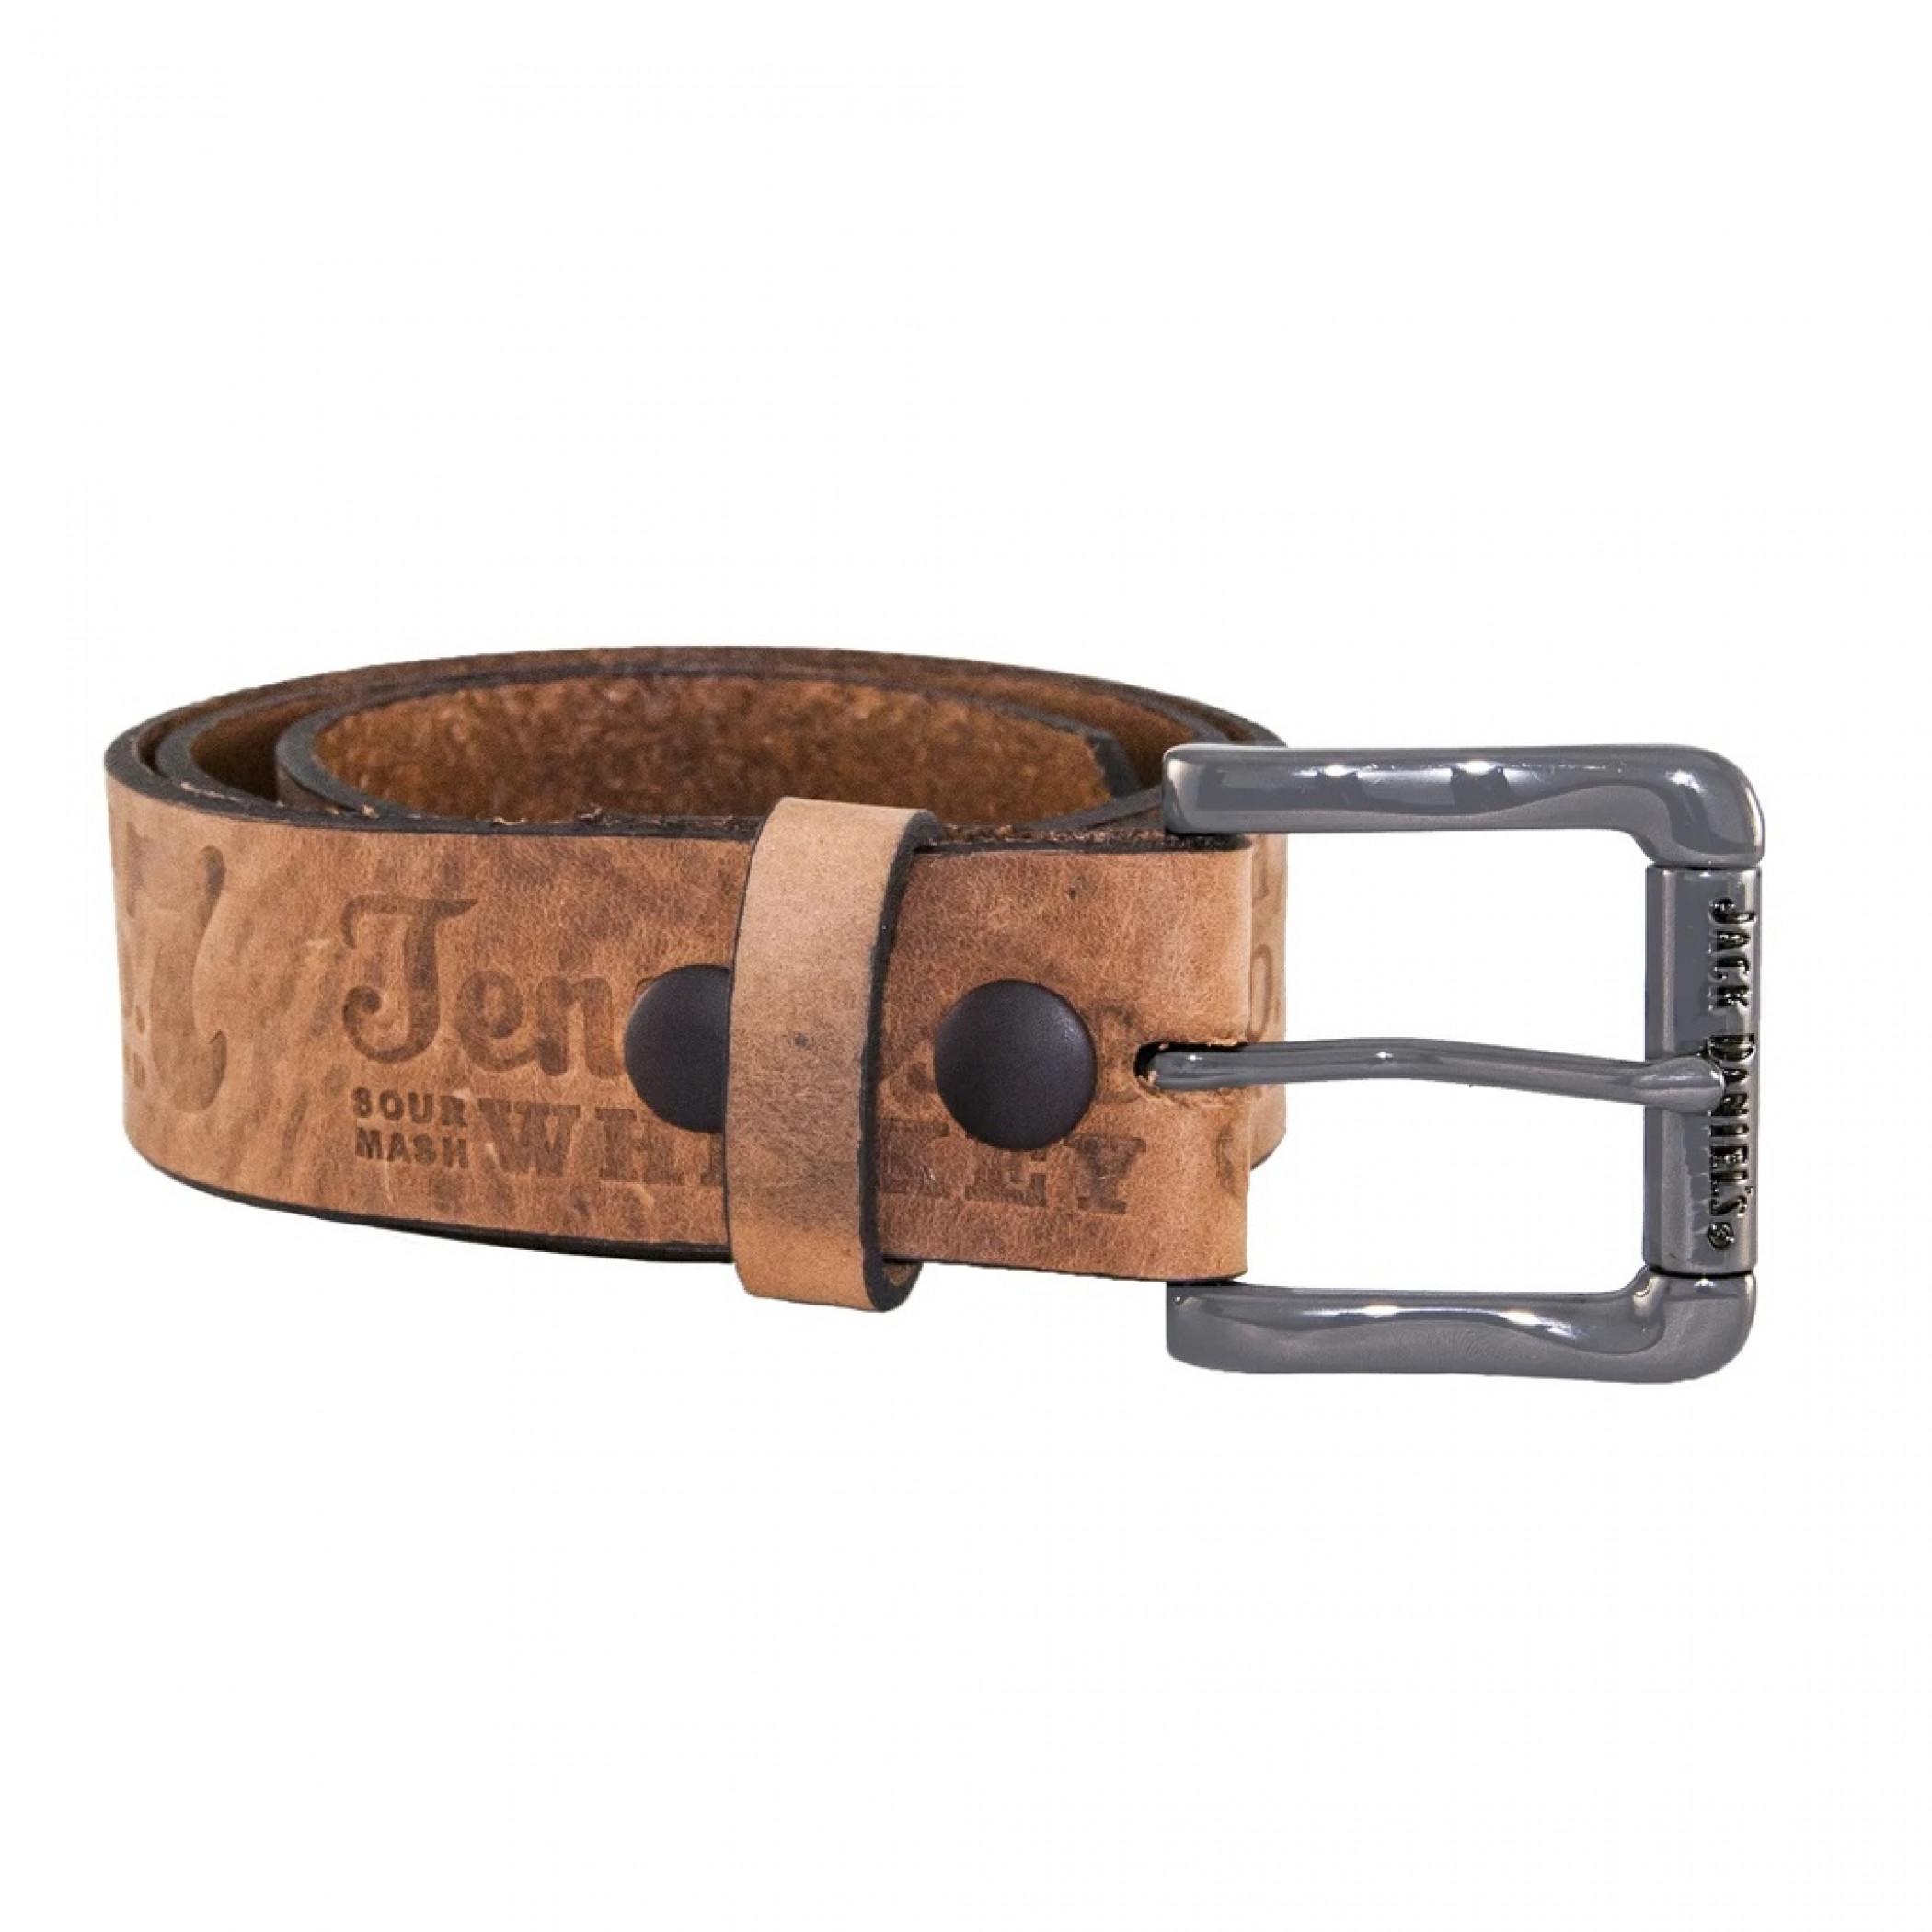 "Jack Daniel's Brown Leather Embossed 1.5"" Belt"